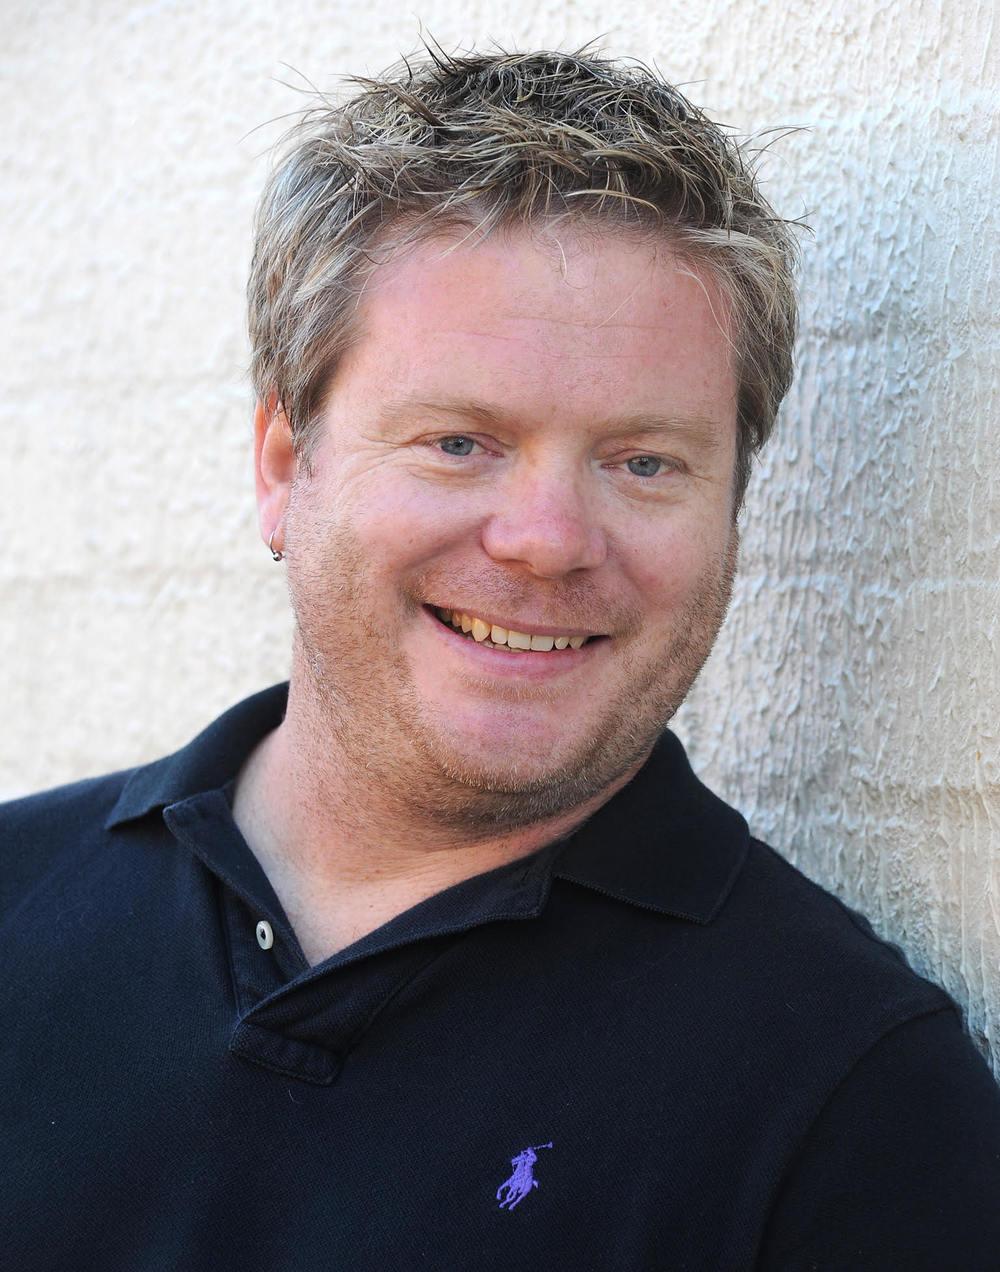 Adam Lowe